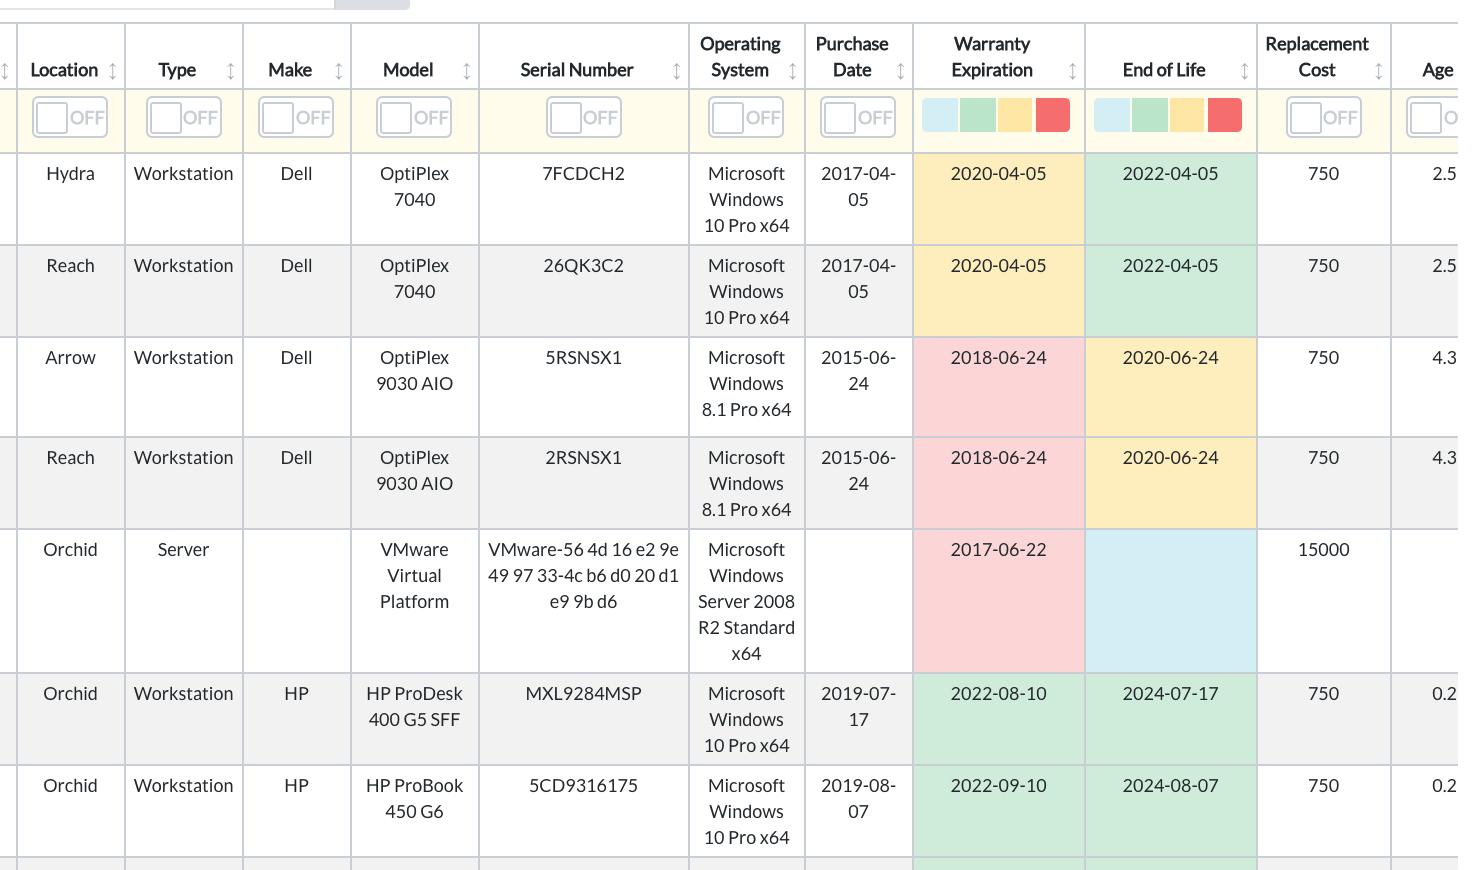 asset list sample